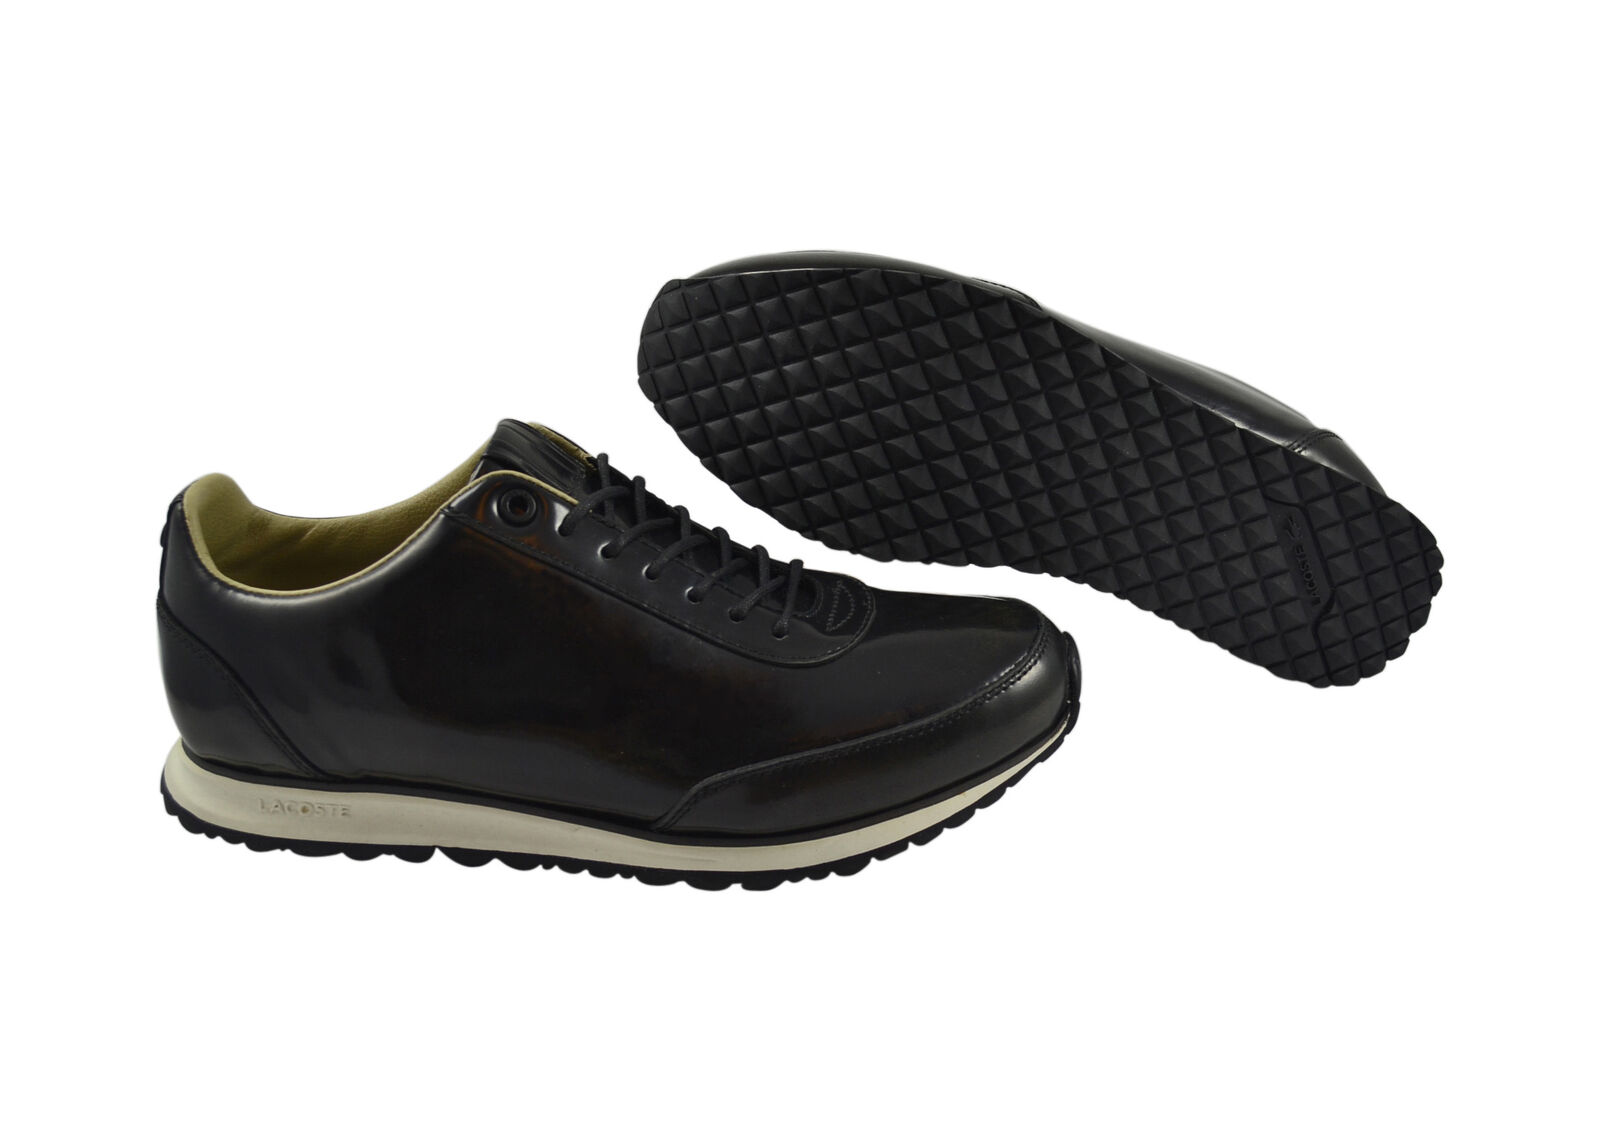 Lacoste Helaine Runner 3 SRW dark grey black Schuhe Sneaker Sale